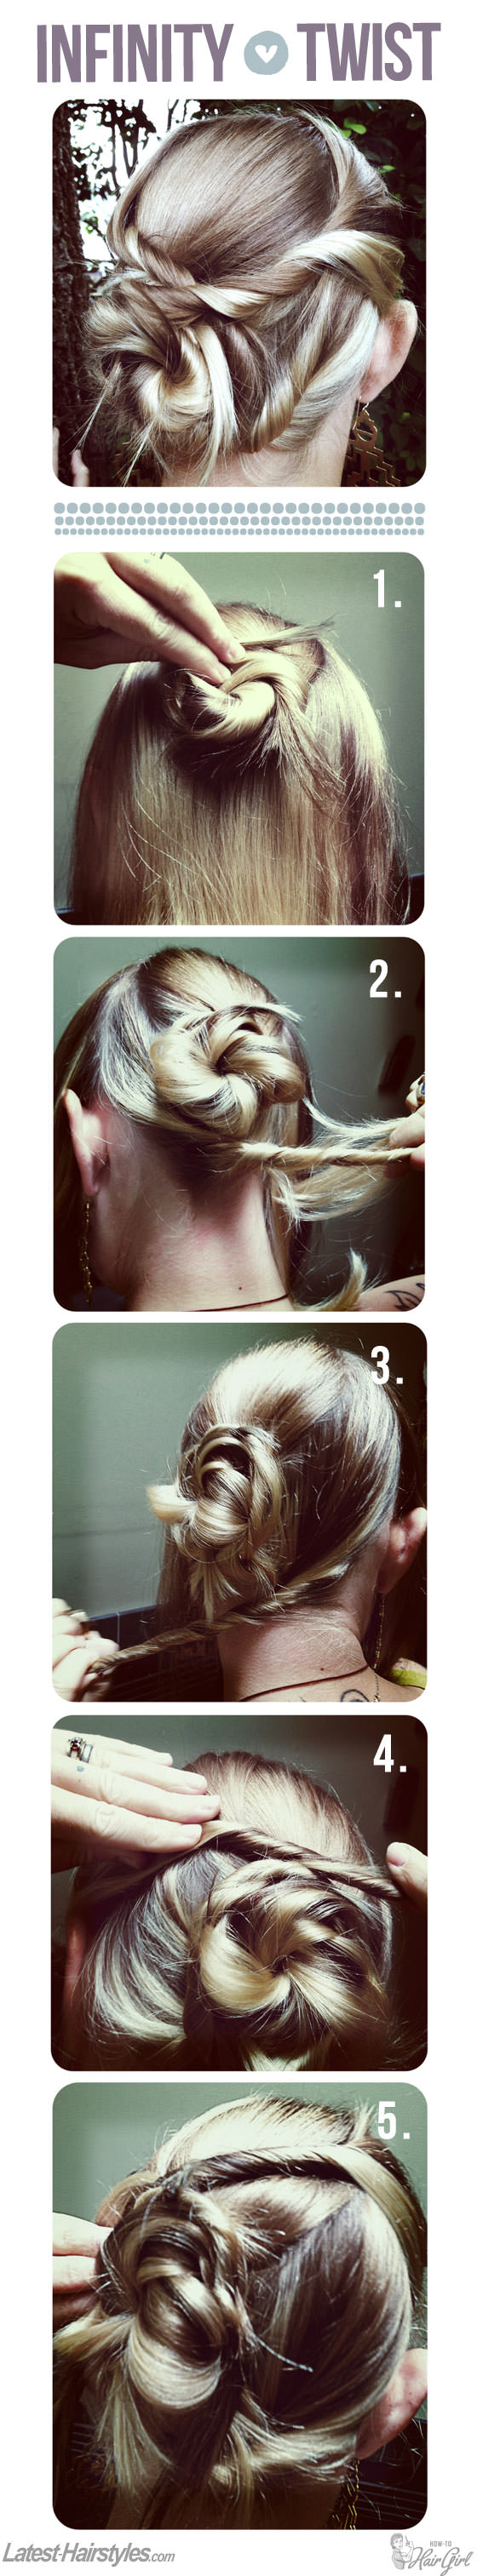 Infinity Twisted Bun Hair